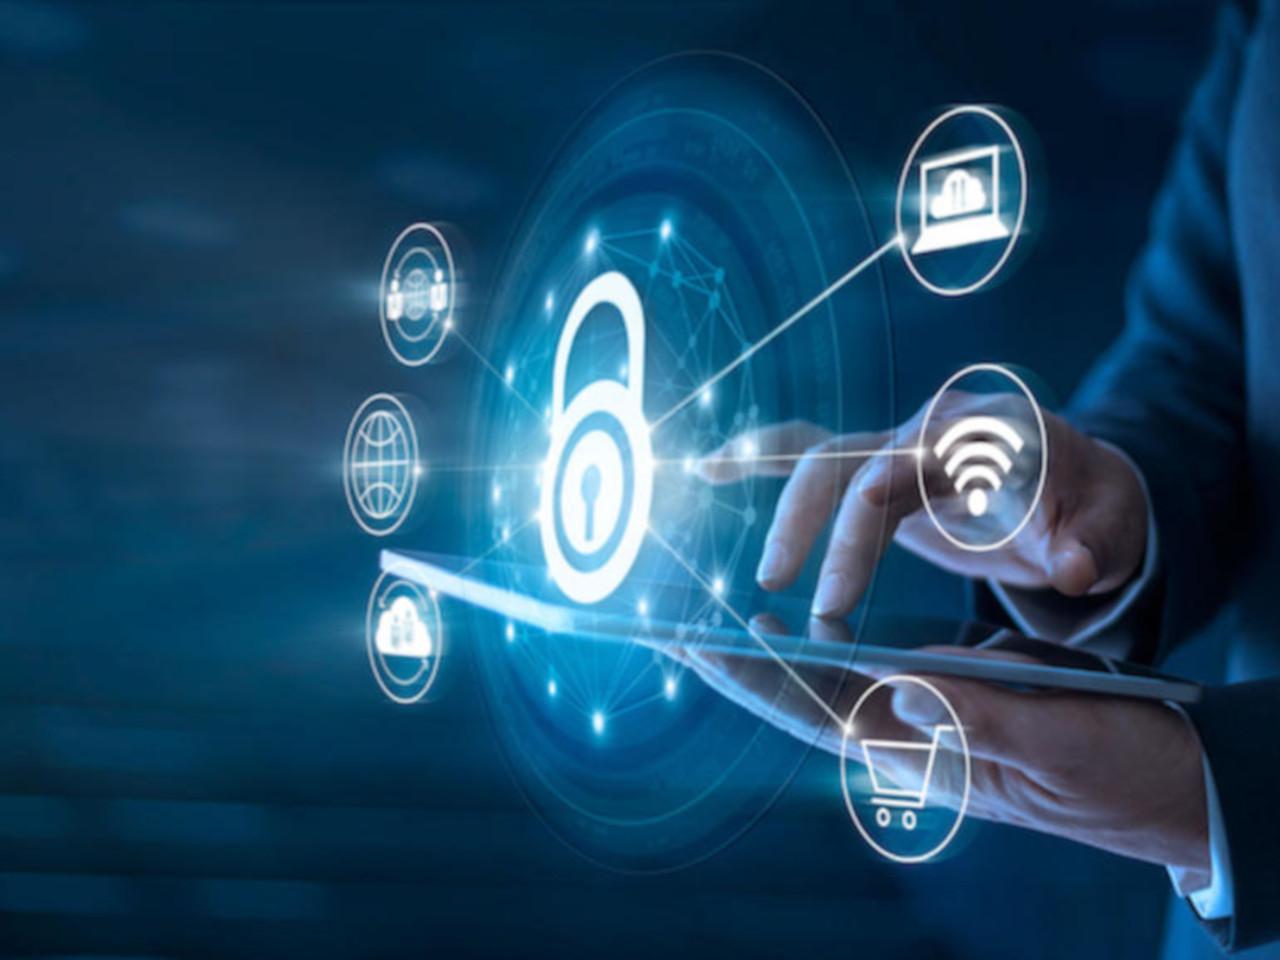 Nec、セキュリティサービスを新提供 専門外の社員による運用を考慮 Zdnet Japan